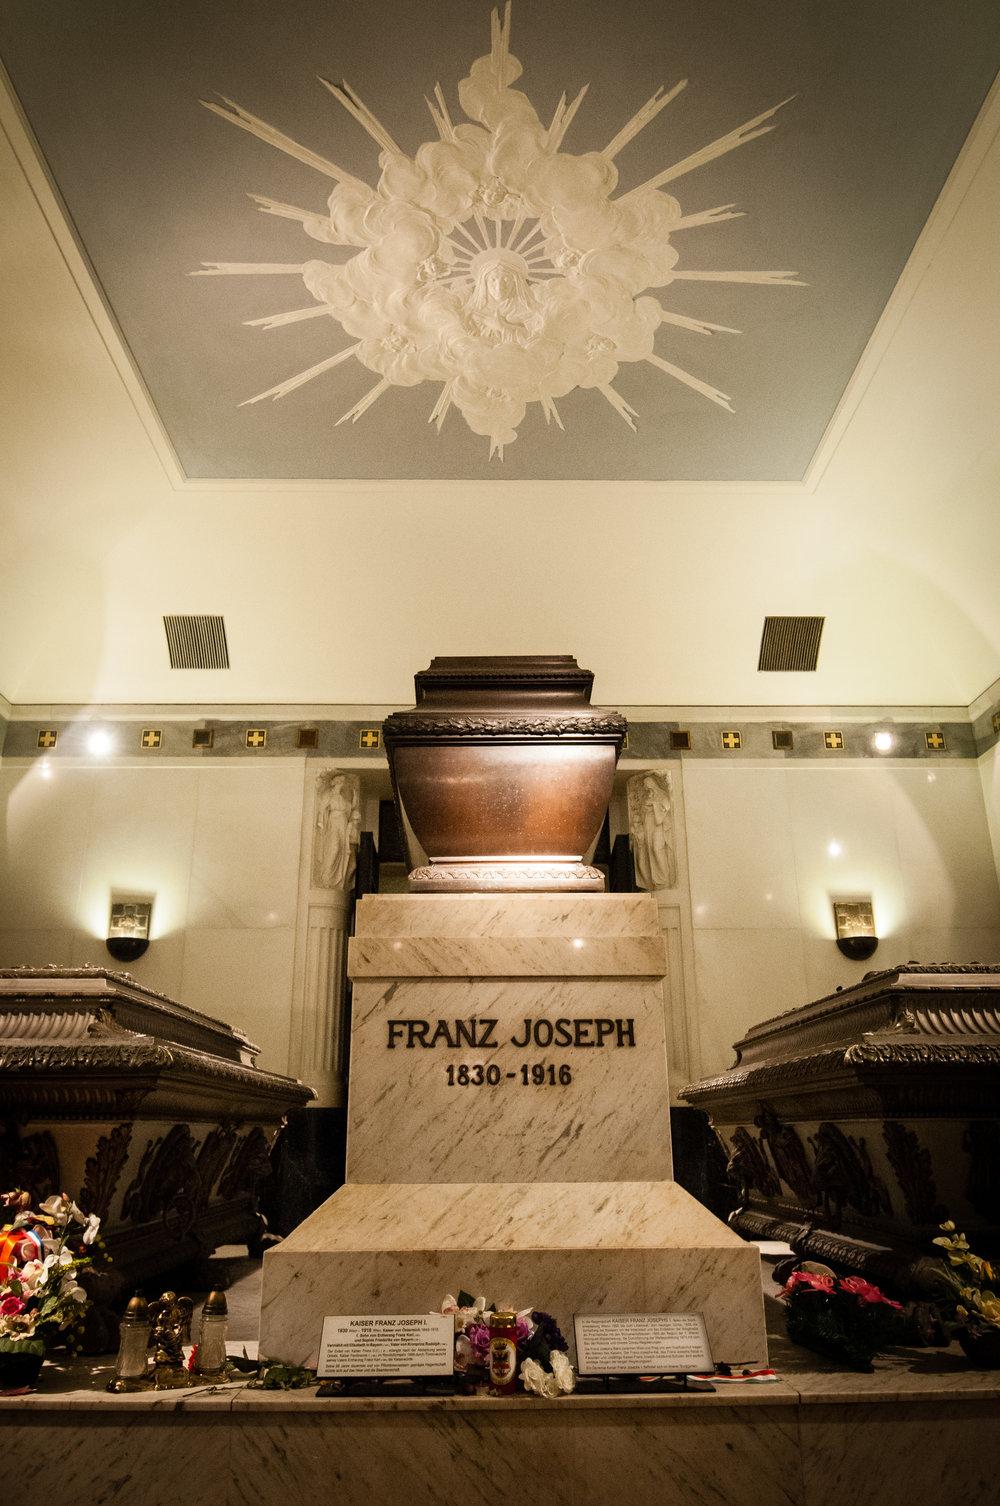 Sarcophagus of Emperor Franz Joseph, Imperial Crypt, Vienna